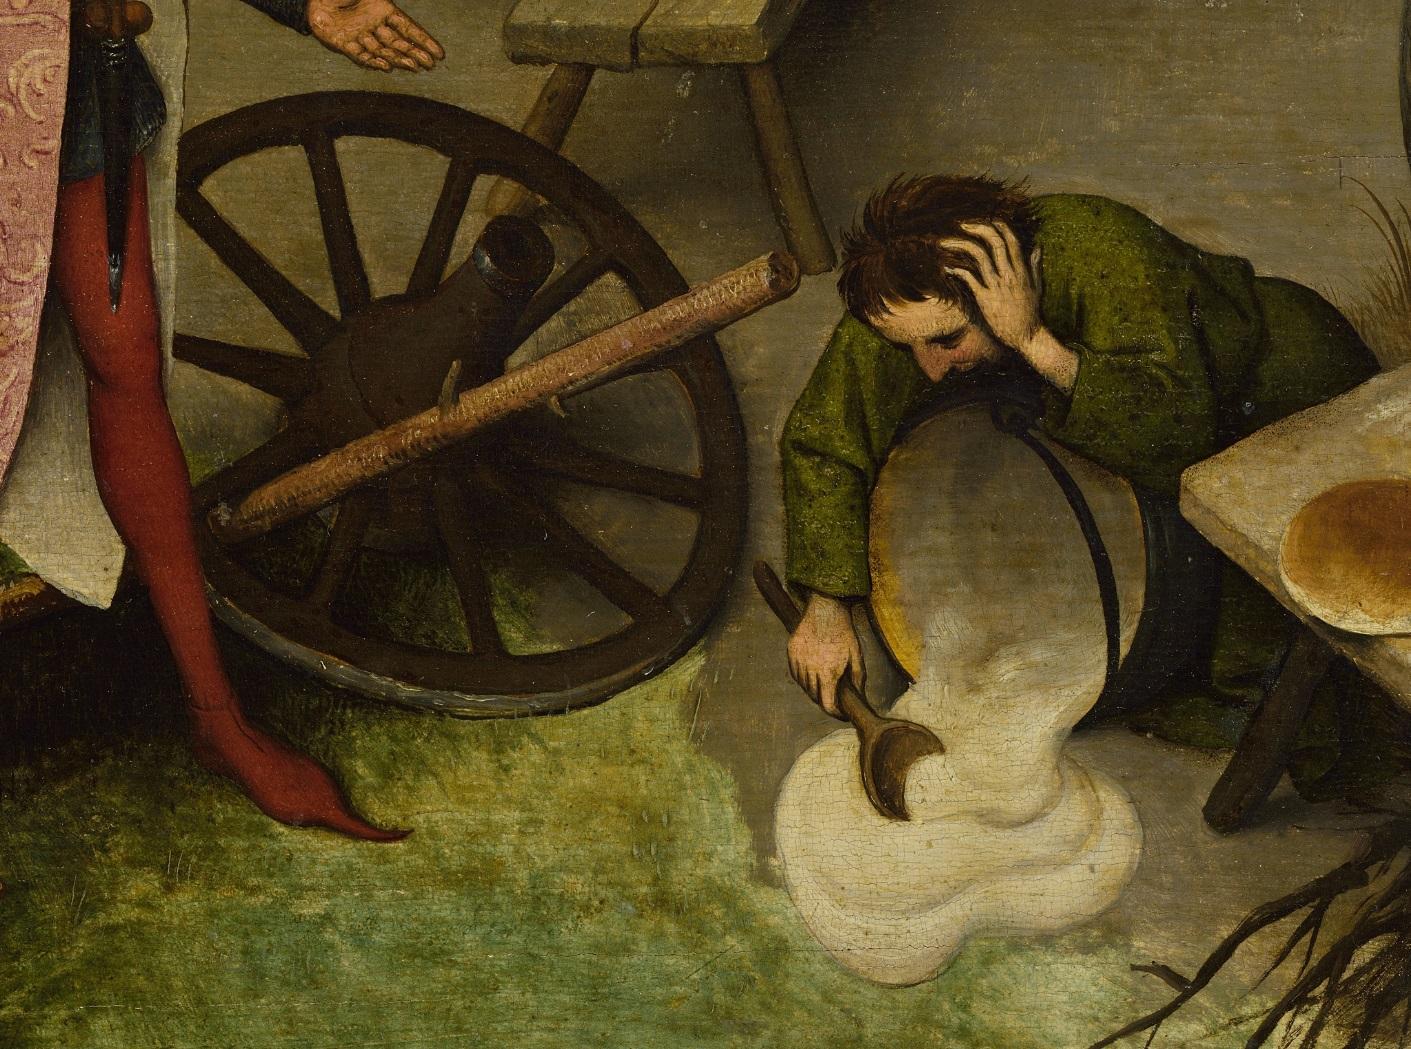 brueghel-proverbs-037.jpg